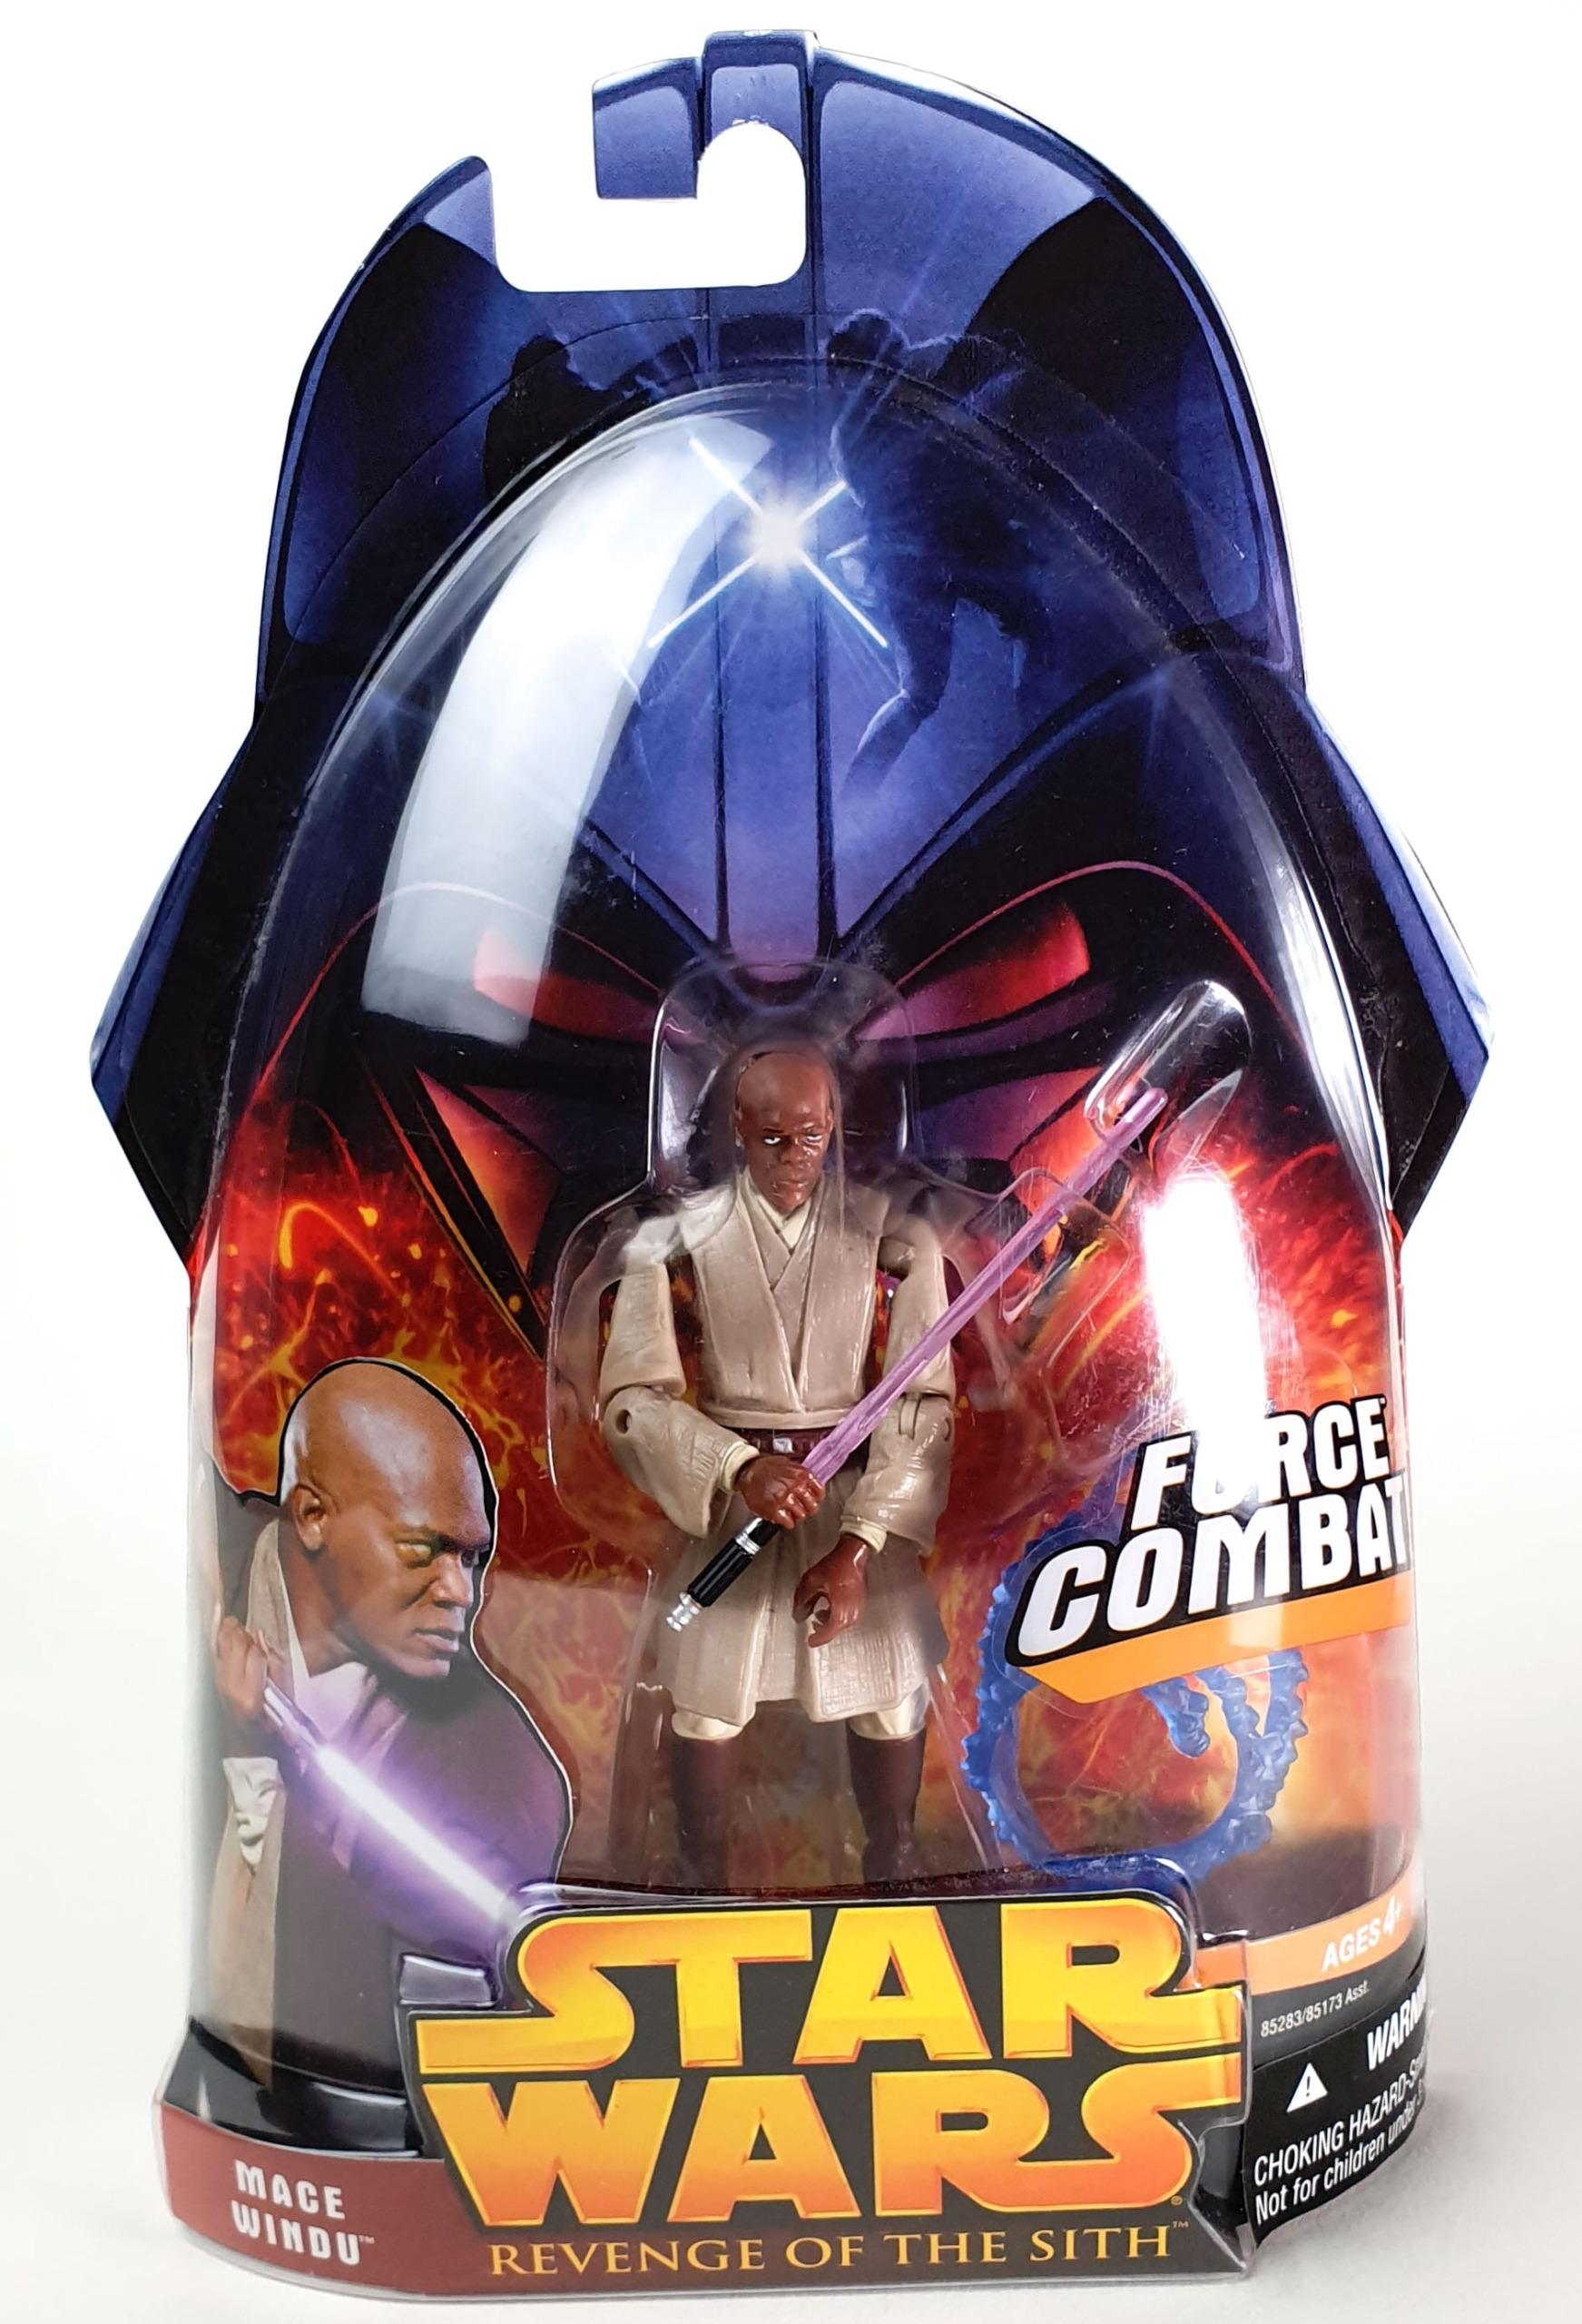 Mace Windu Star Wars Episode Iii Revenge Of The Sith Toy Line Hasbro 2005 Toy Nerds